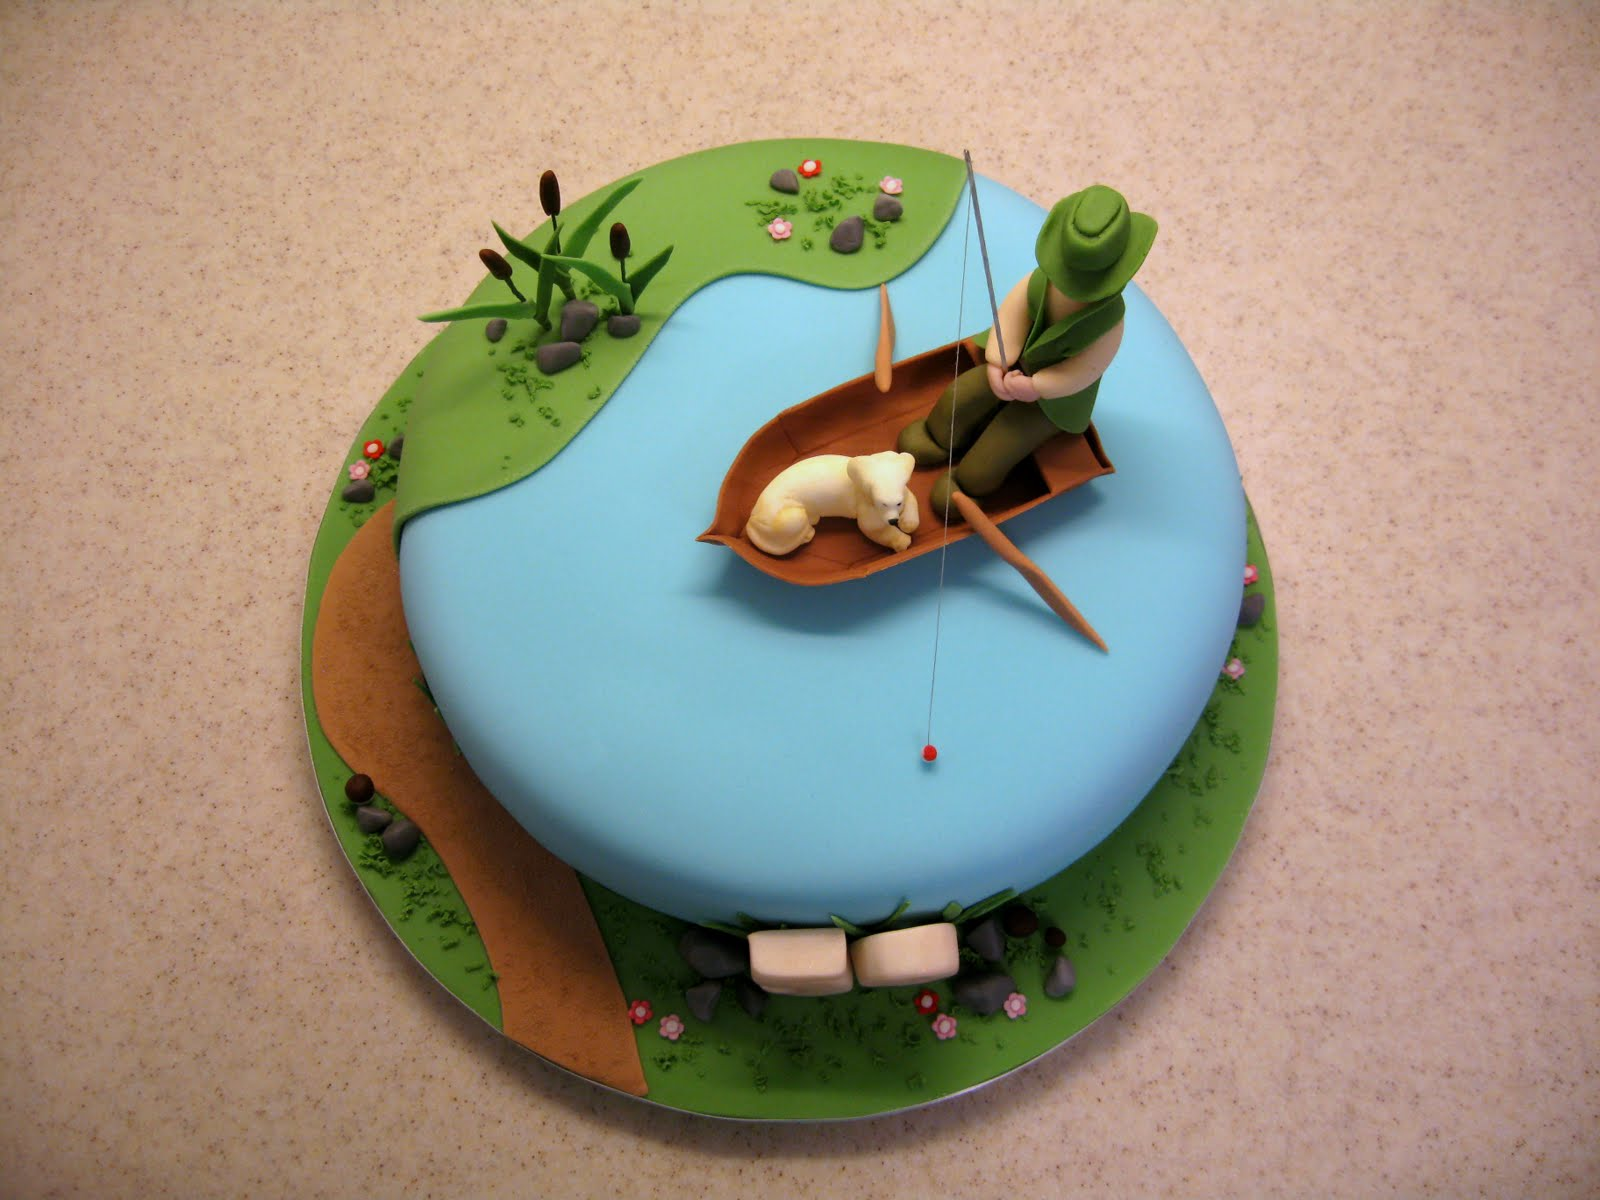 Hana rawlings cake design na ryb ch gone fishing for Fish cake design